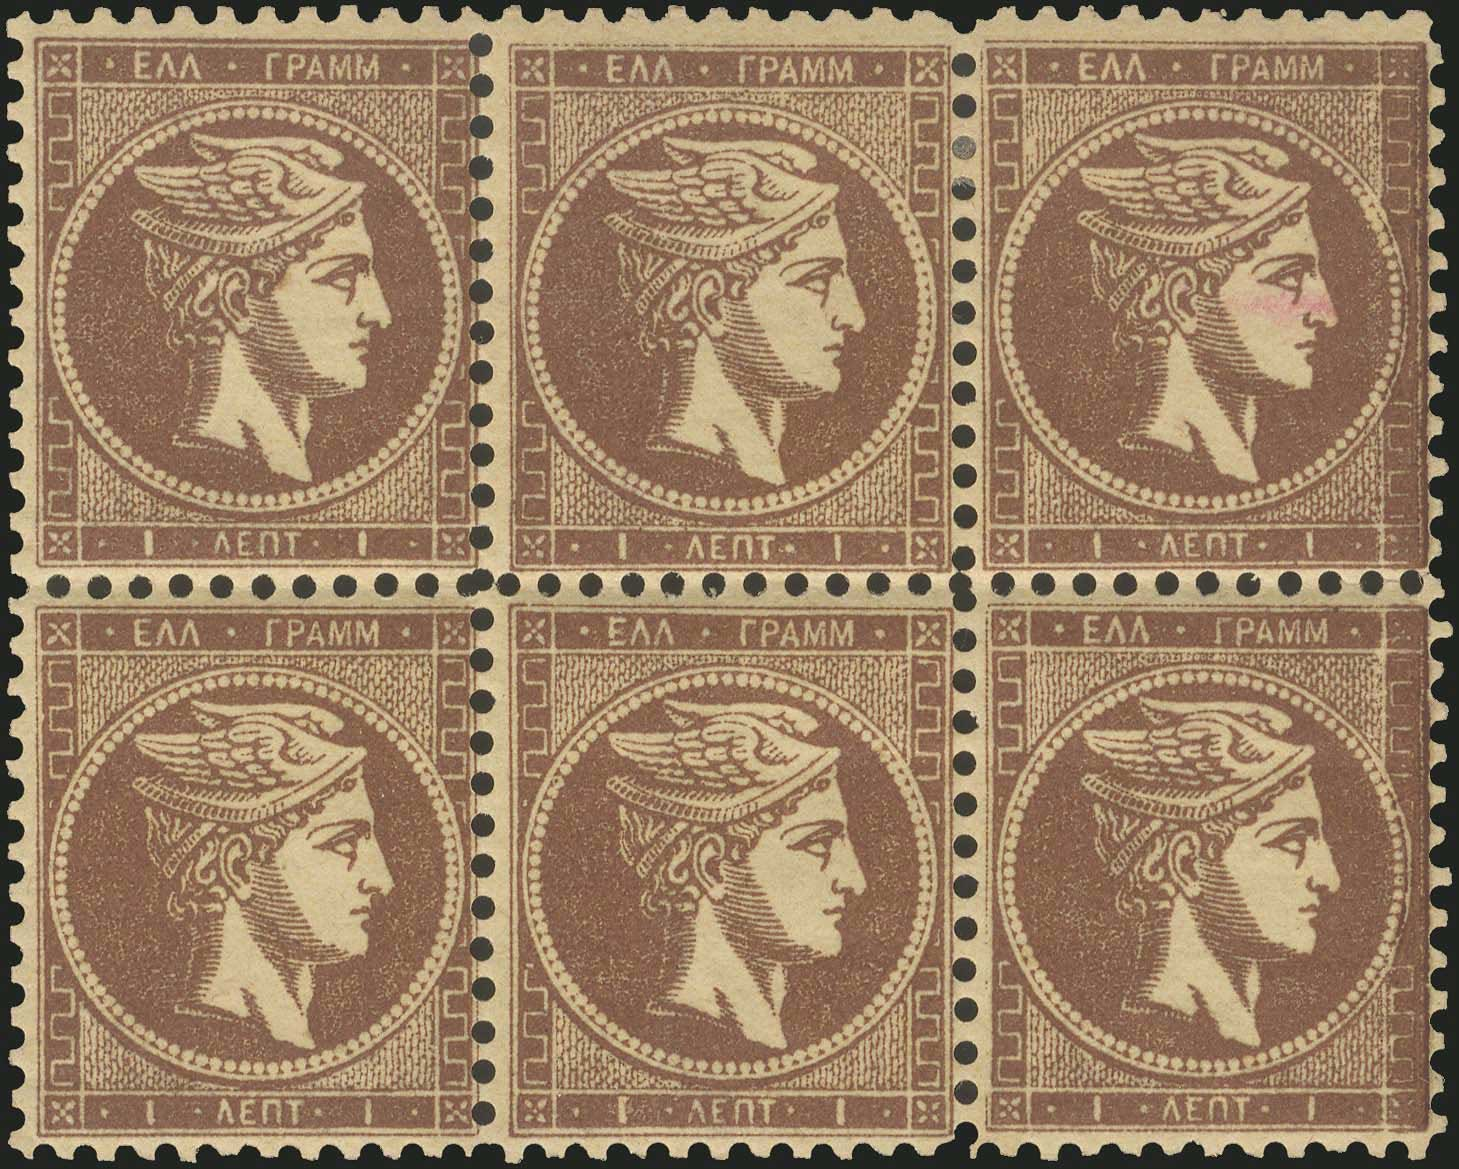 Lot 5211 - -  LARGE HERMES HEAD 1871/76 meshed paper -  A. Karamitsos Public & Live Bid Auction 642 (Part A)